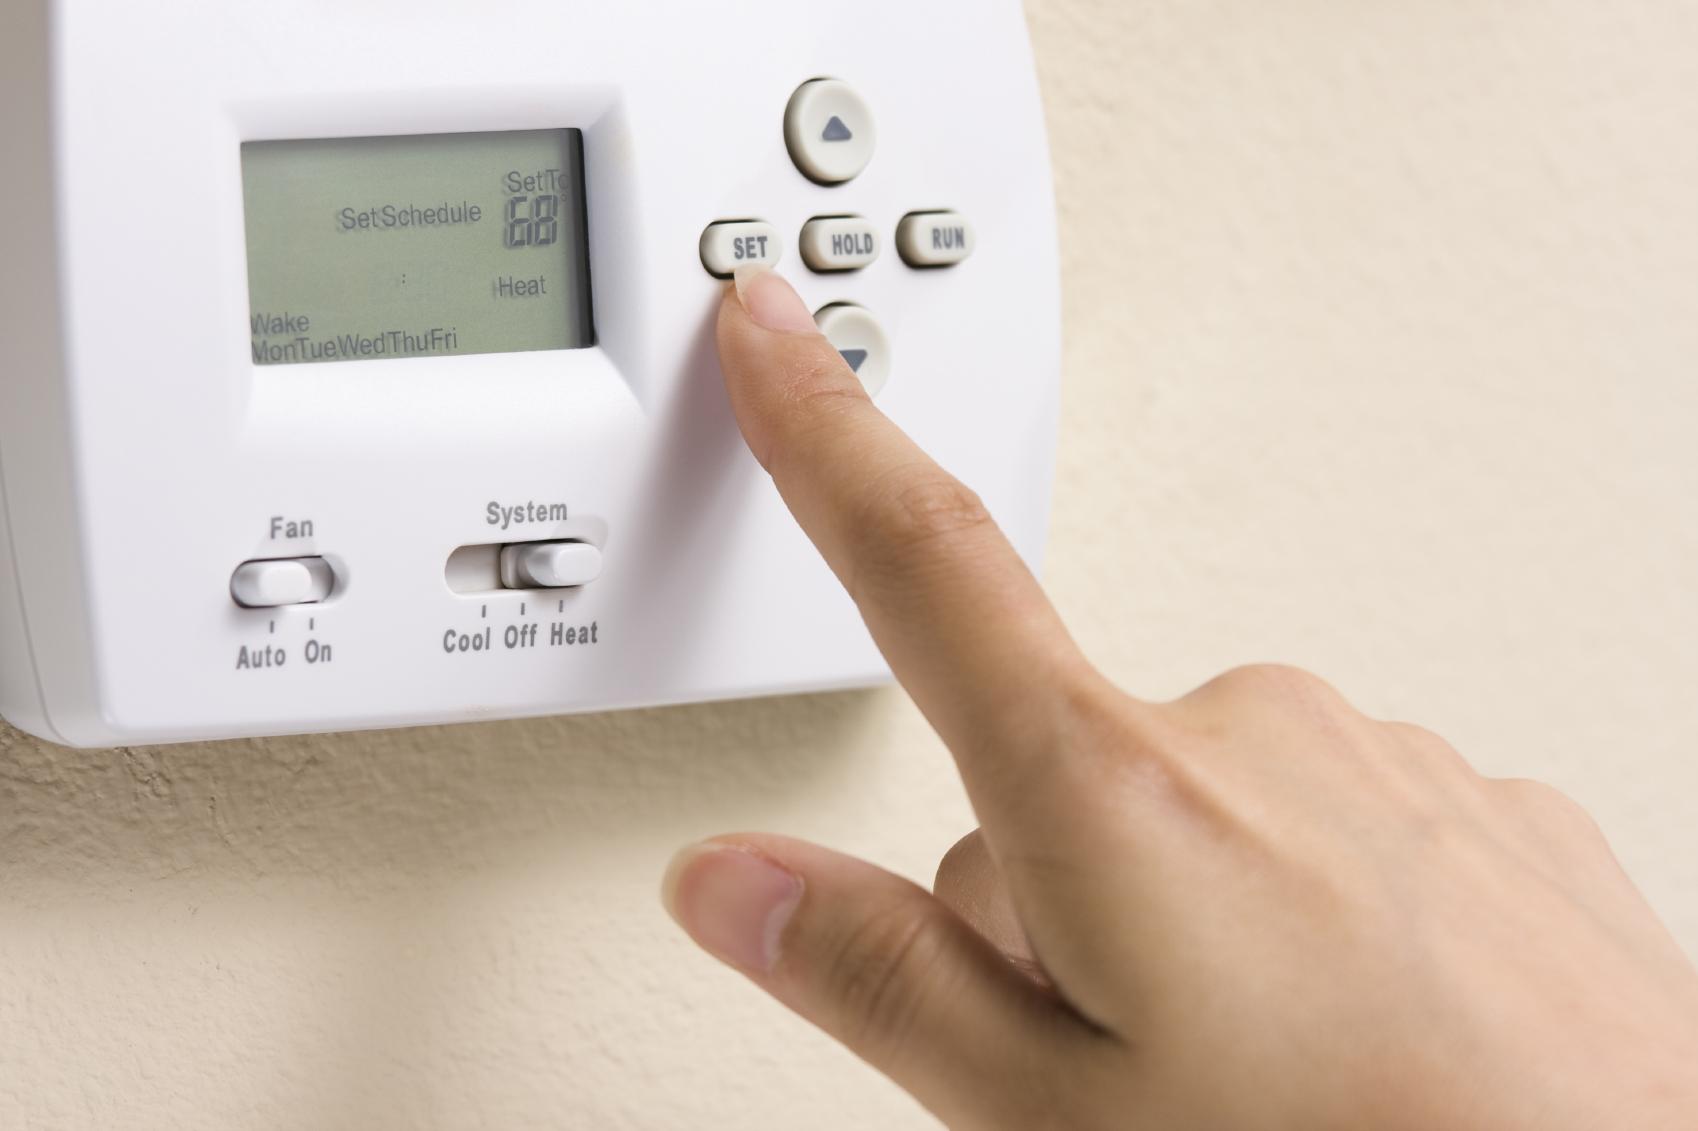 thermostat_000007005670Medium.jpg